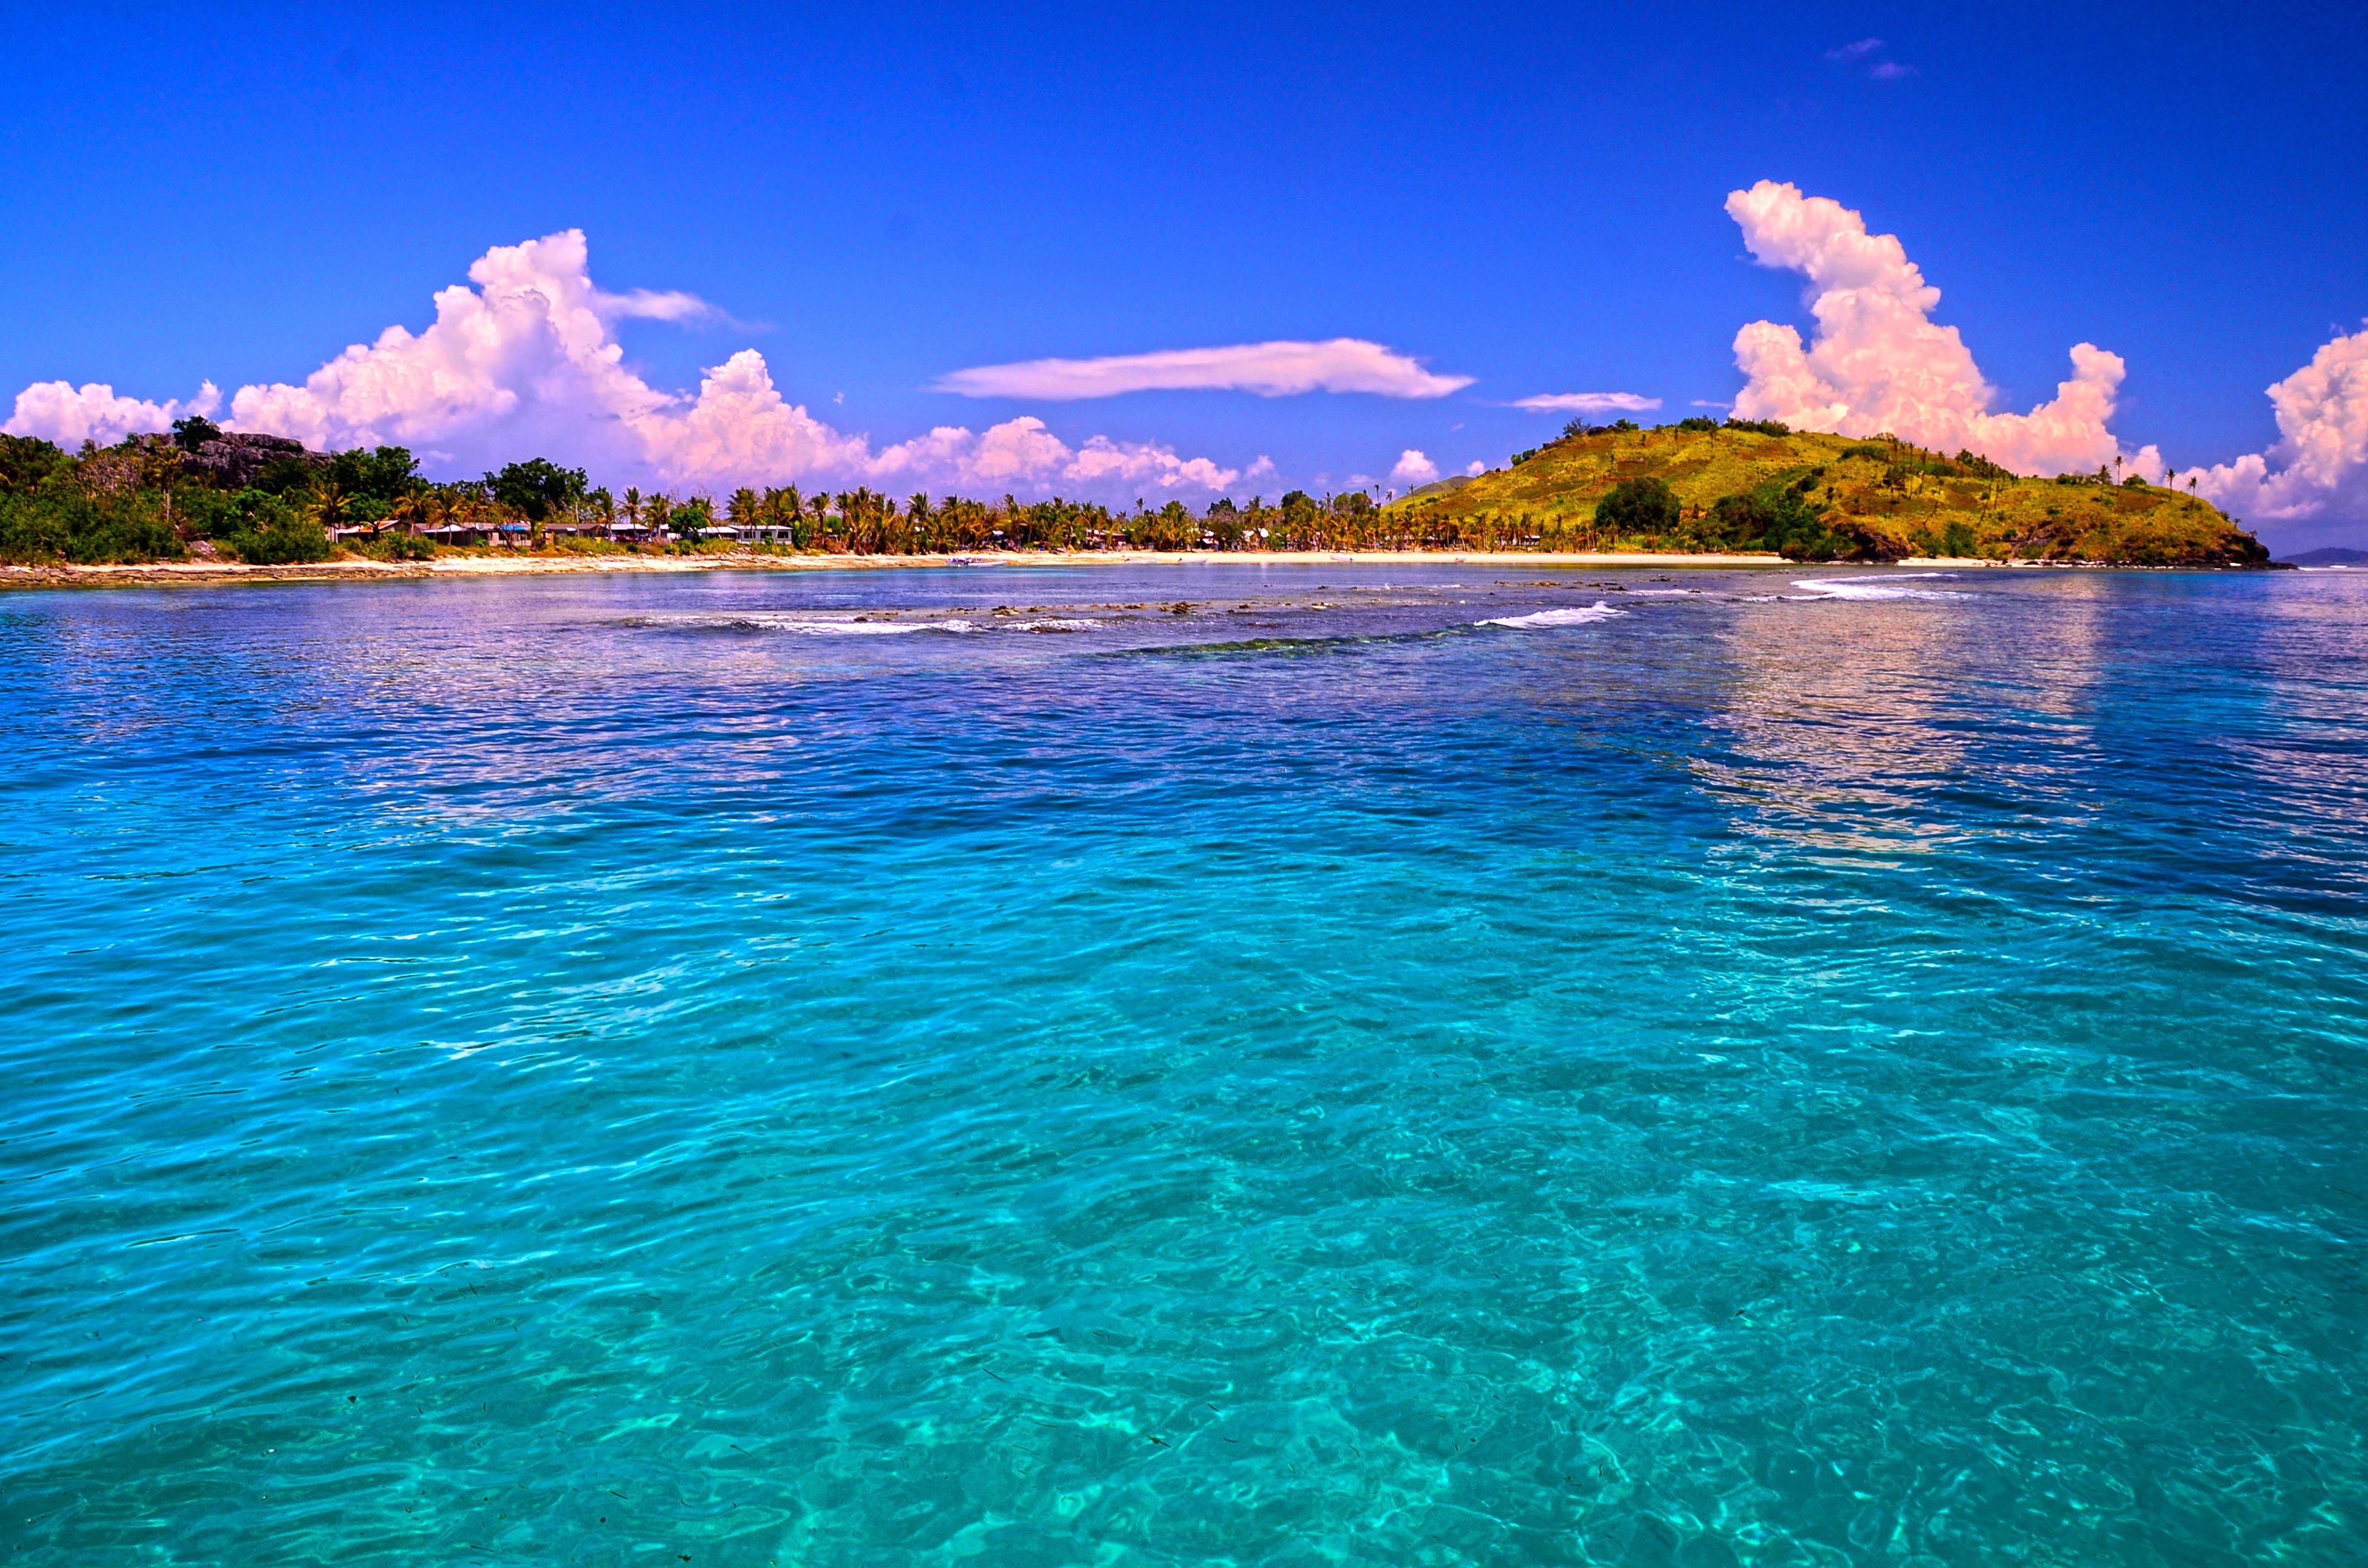 fiji-yacht-charter-9-days-route-itinerary